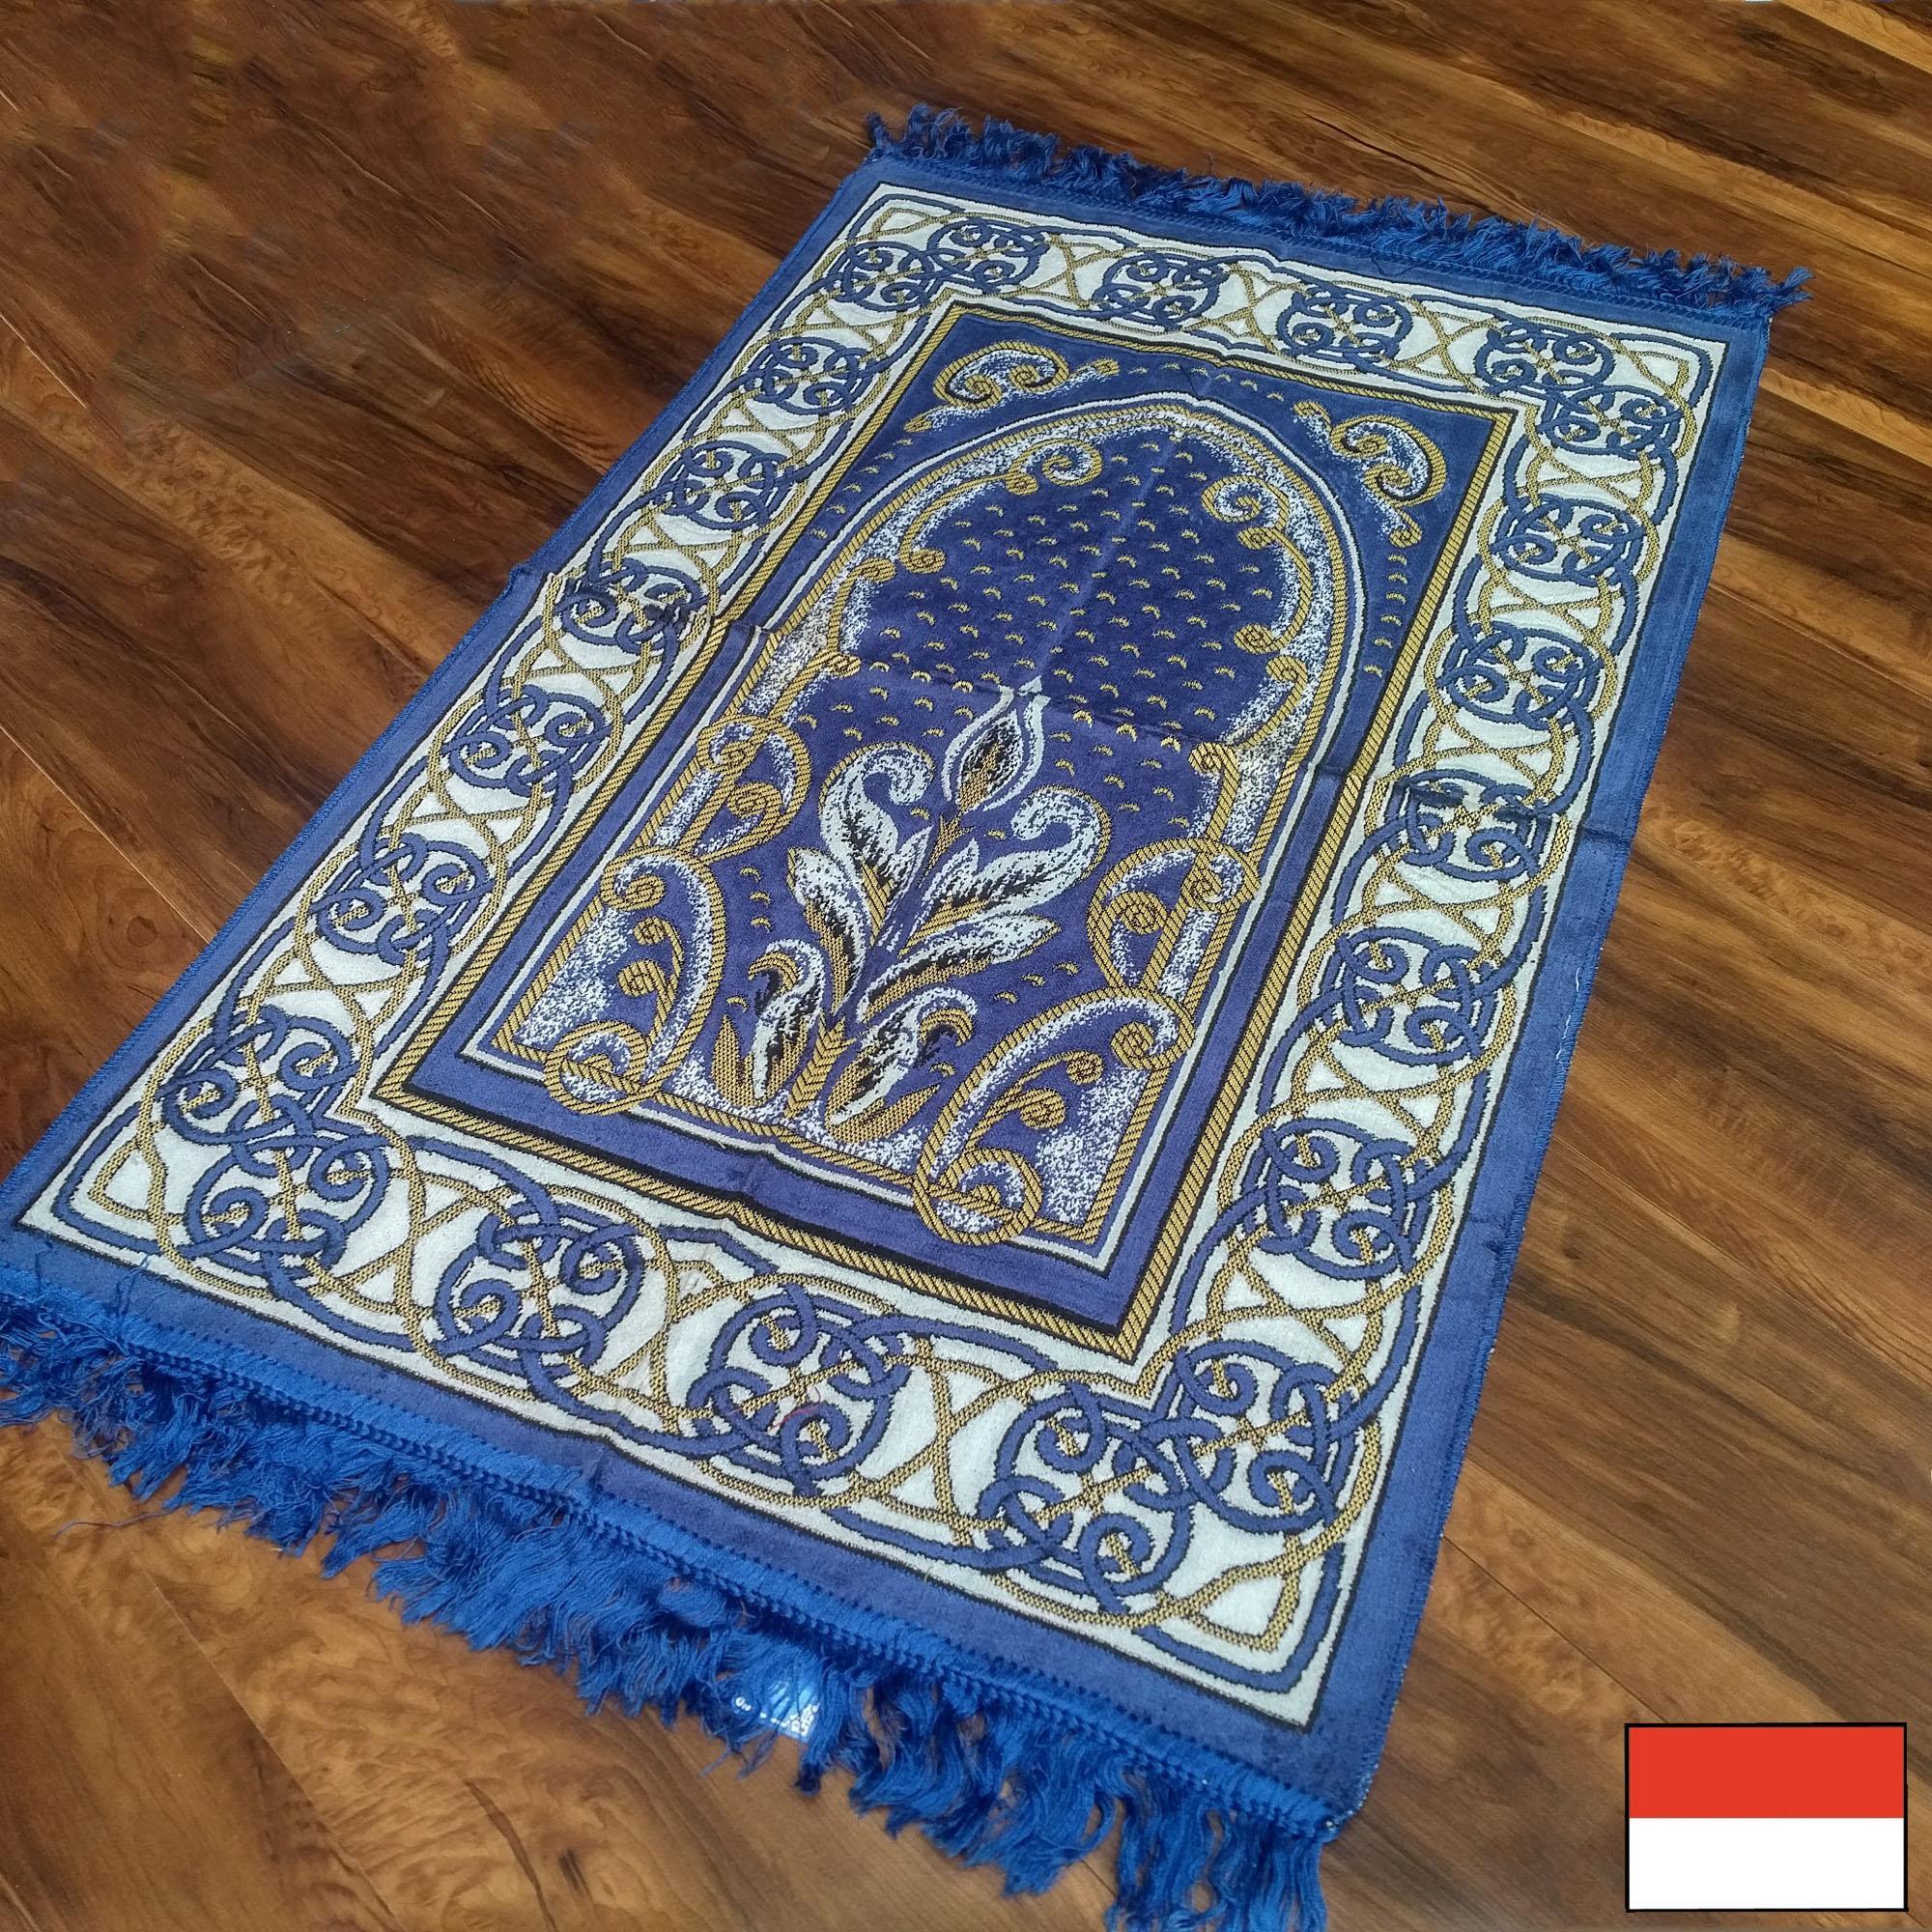 ... ROLL Medeena 105 x 570 cm 21003 Pilar Hijau. Source · Al-Shiraz - Sajadah Turki Beludru / Bulu 68 cm x 110 cm - Biru